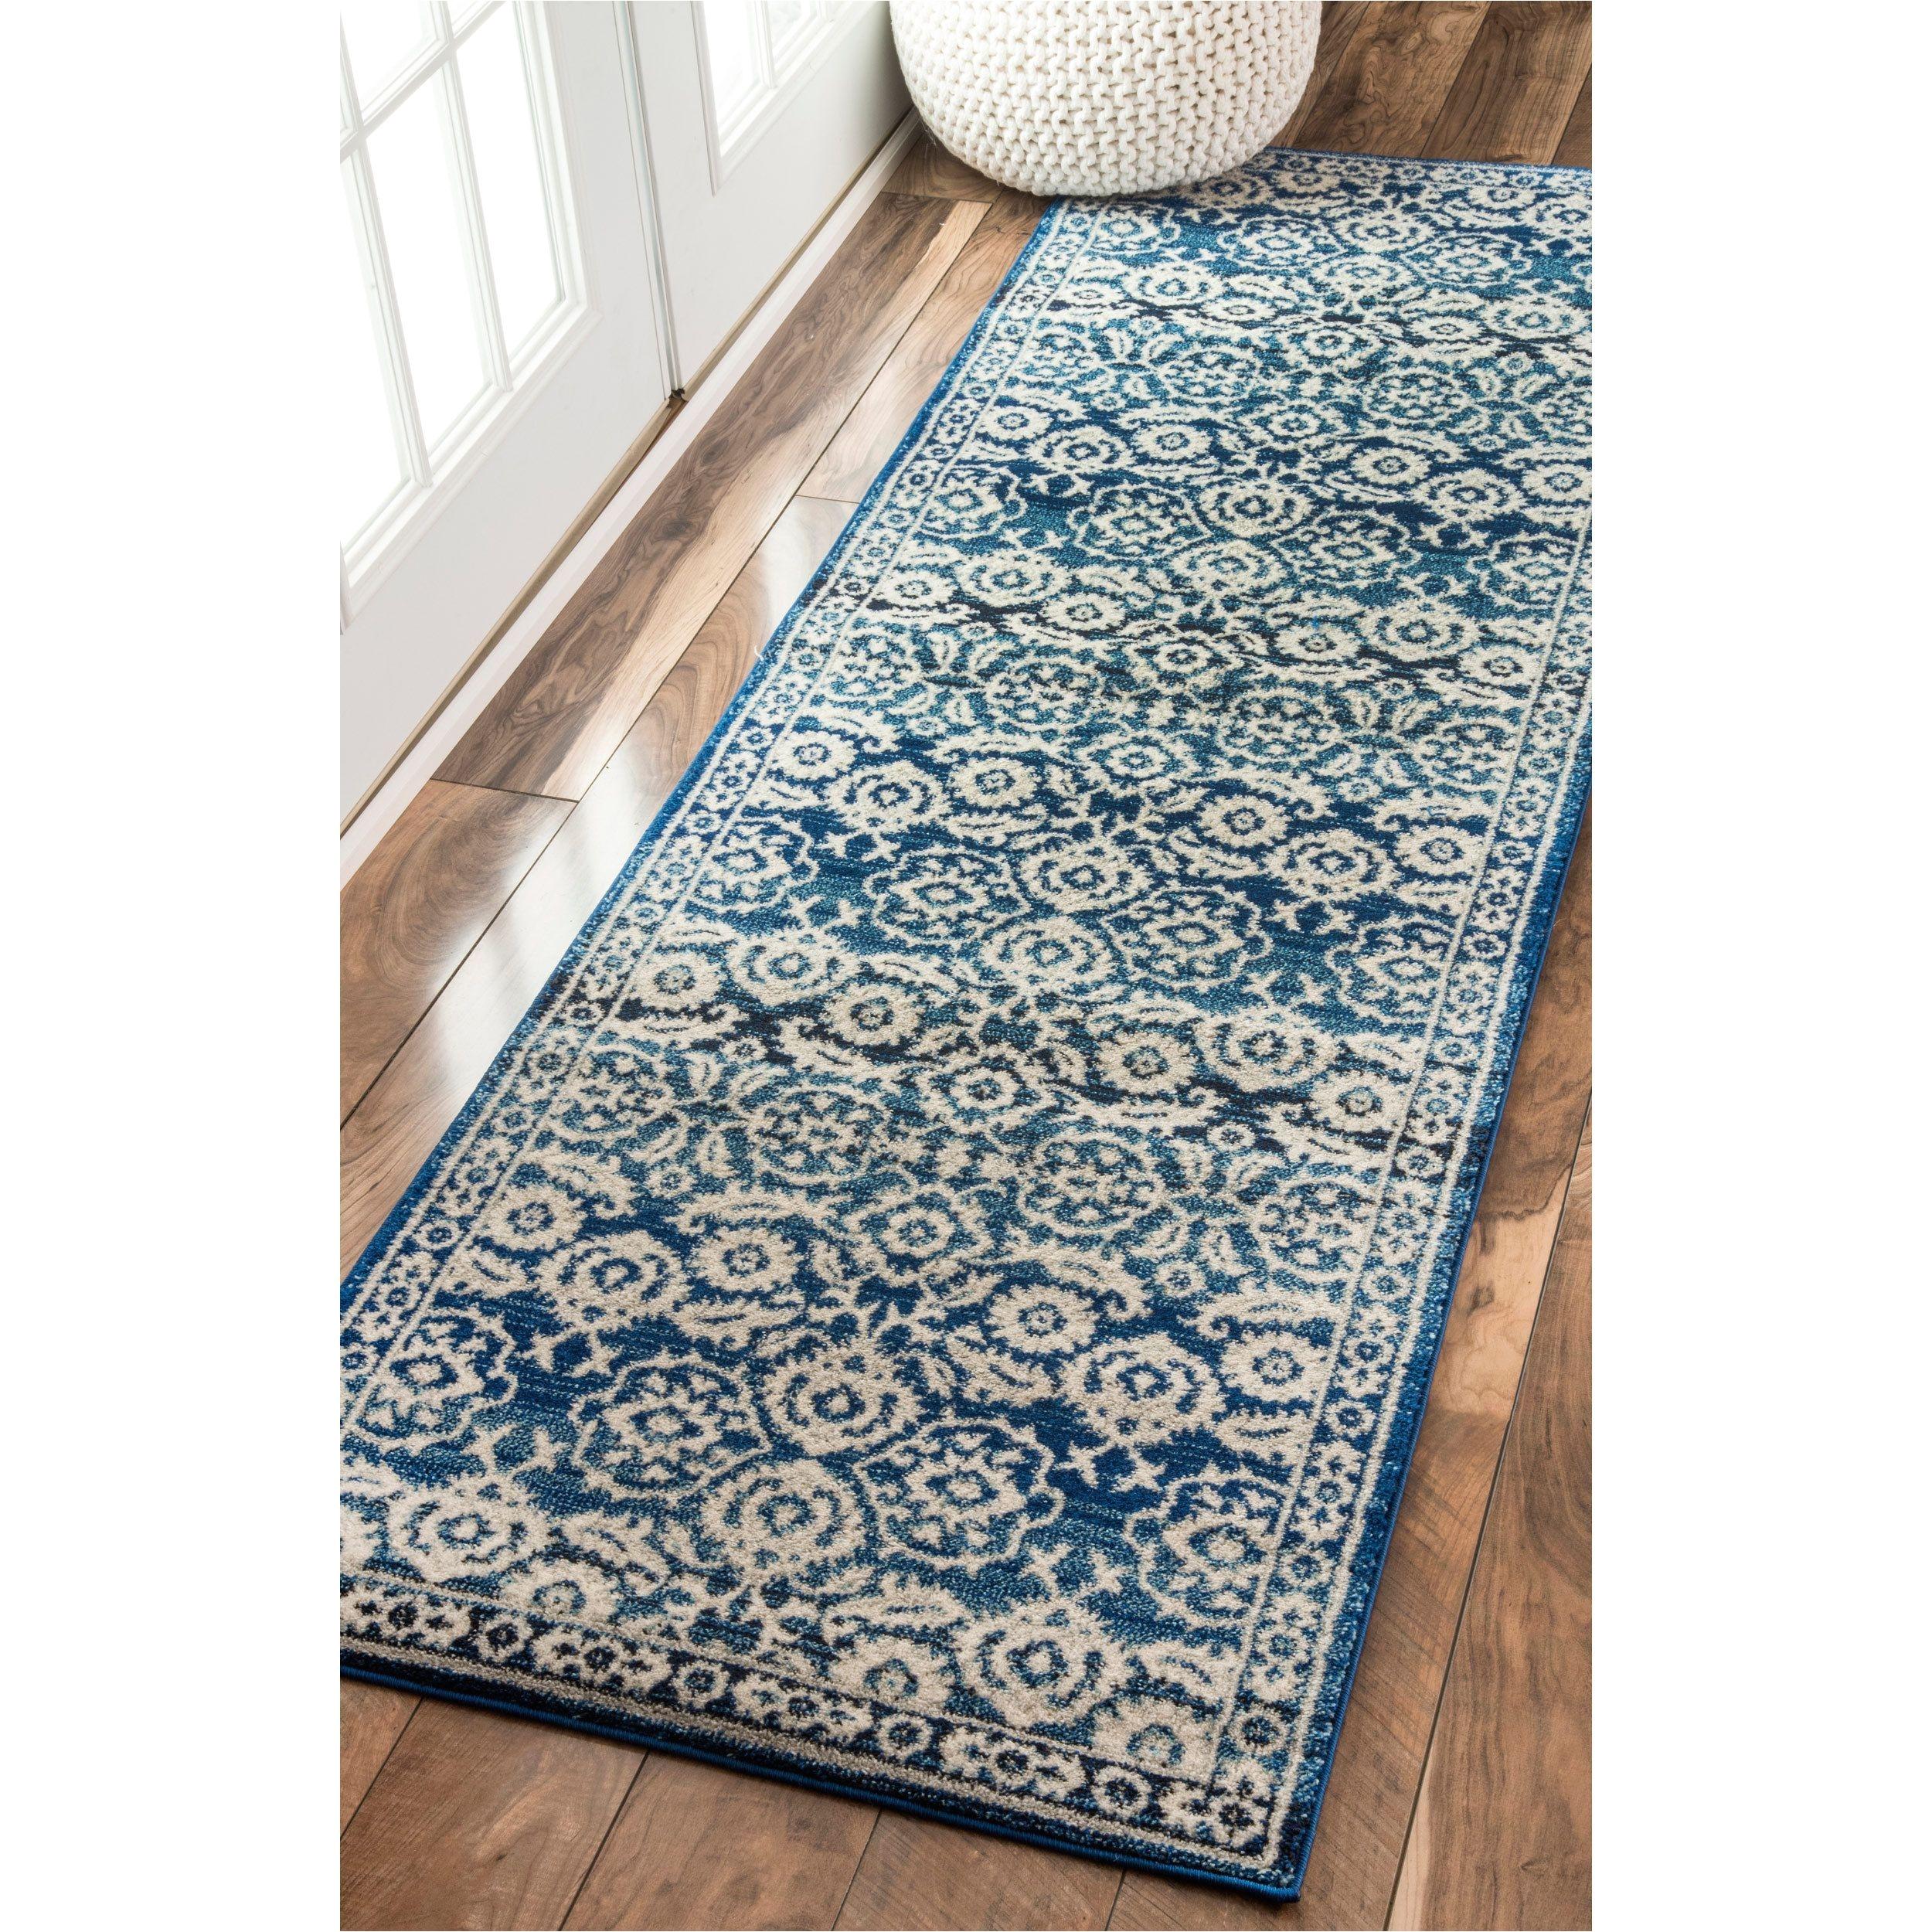 nuloom traditional persian vintage dark blue runner rug x dark blue size x plastic abstract